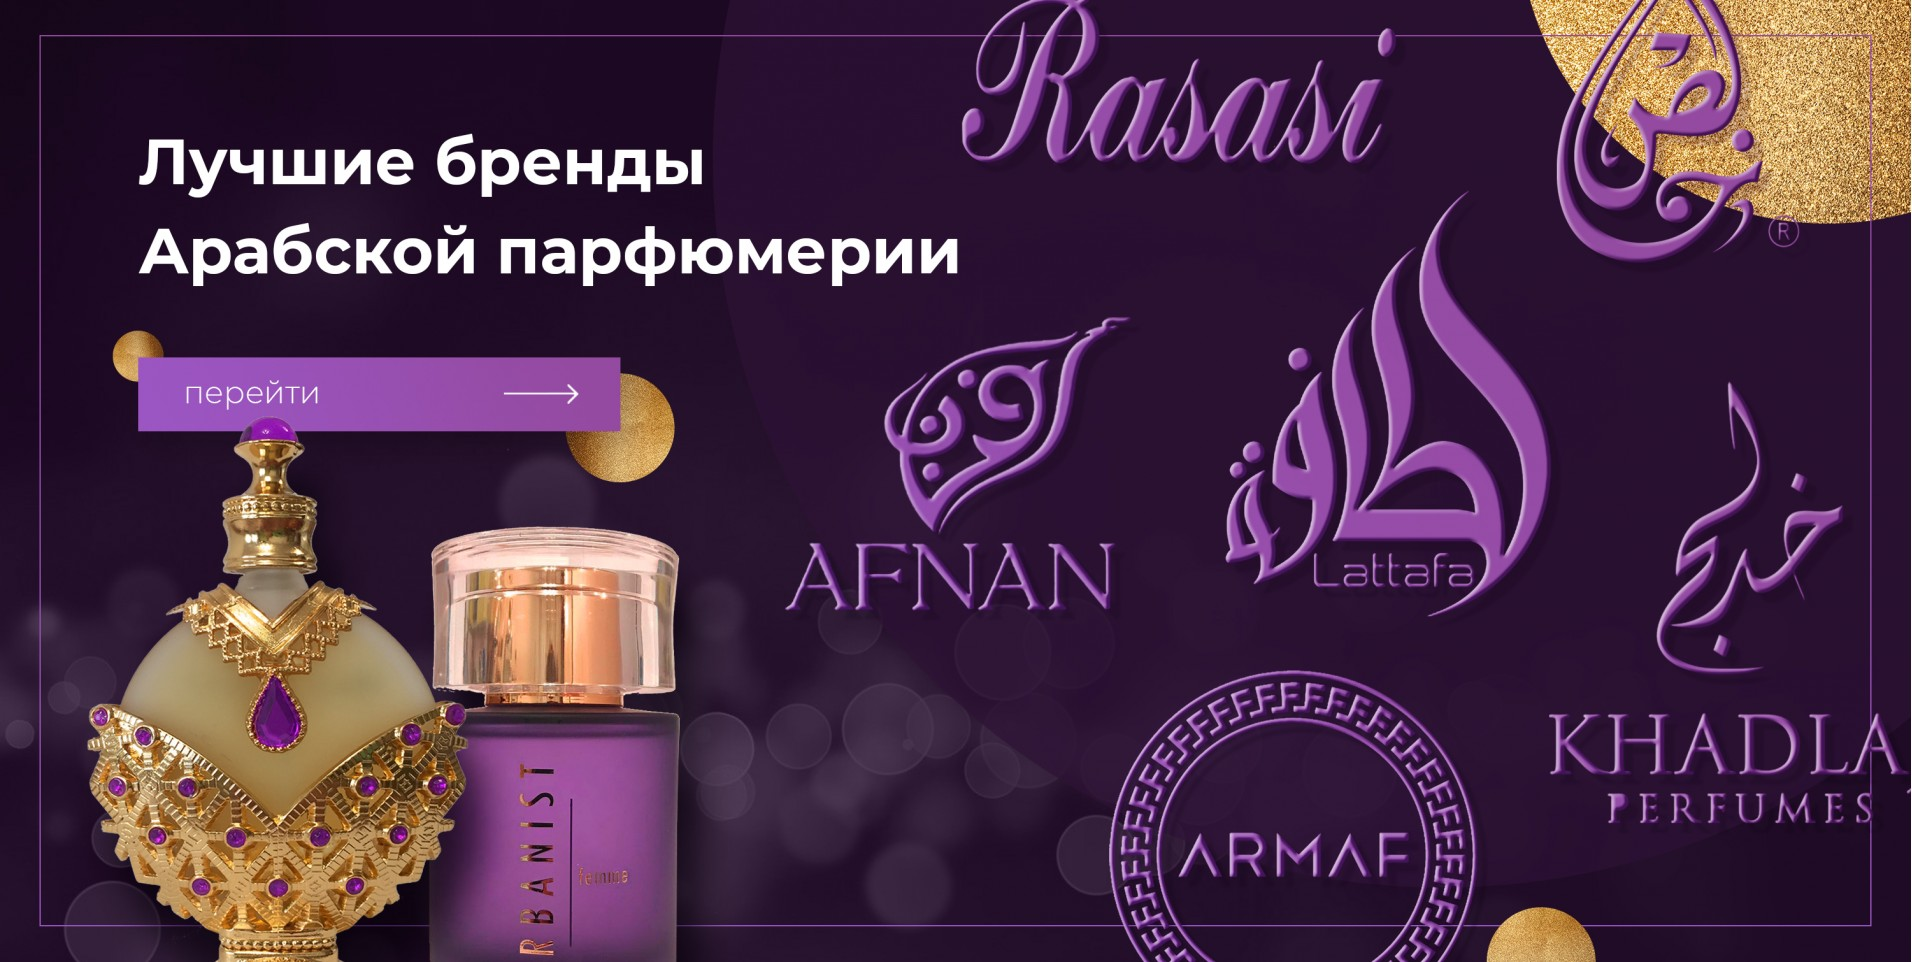 Роскошная арабская парфюмерия